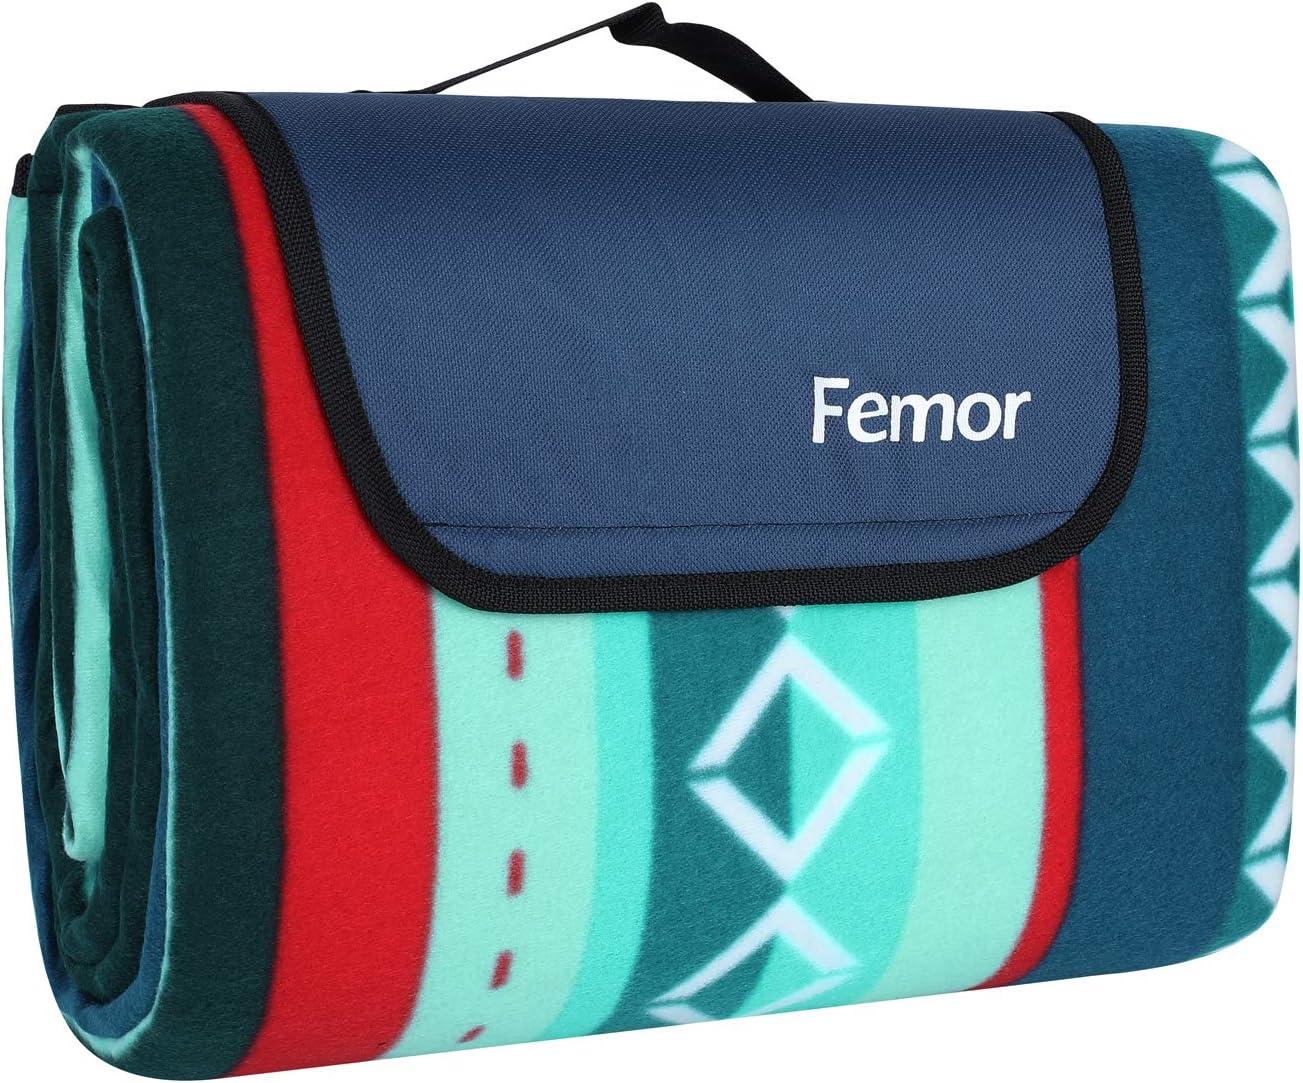 Femor Manta de Picnic 200 x200cm Impermeable con Base de Aluminio Duradera, Alfombra Plegable para Camping Playa Parque (Rayas Verdes)